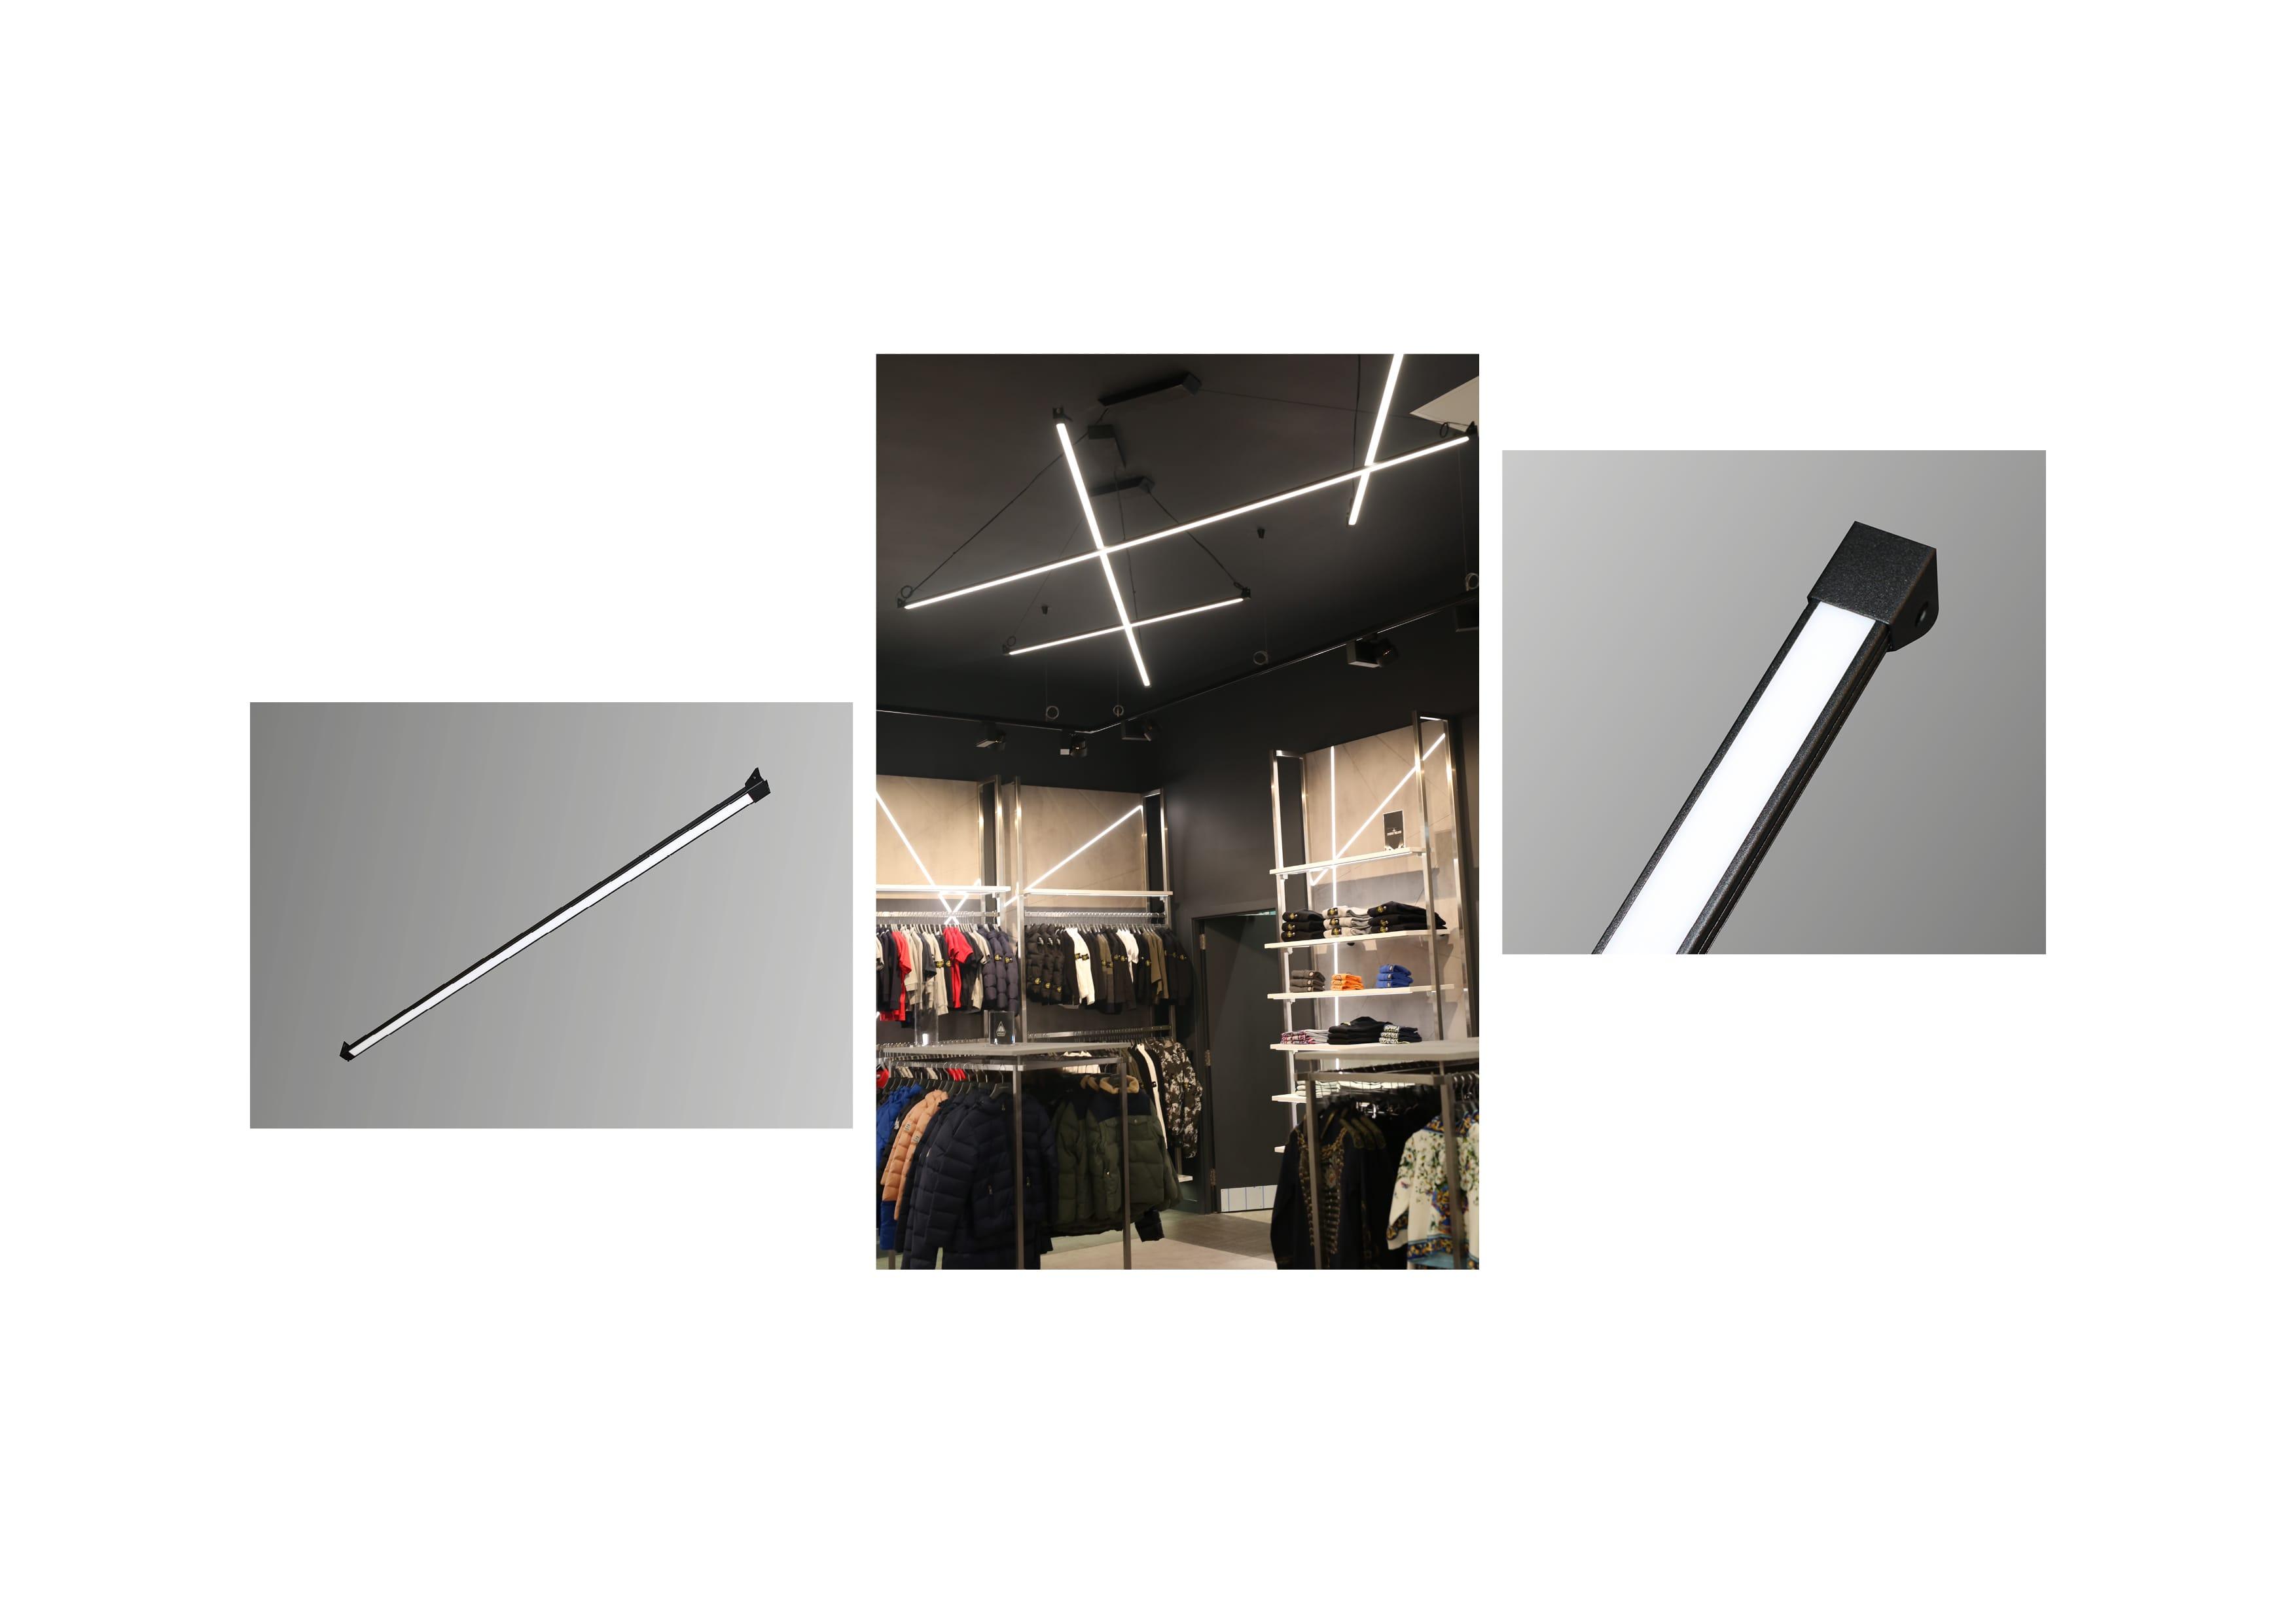 https://contrac-lighting.co.uk/wp-content/uploads/2018/01/SABRE-2.jpg